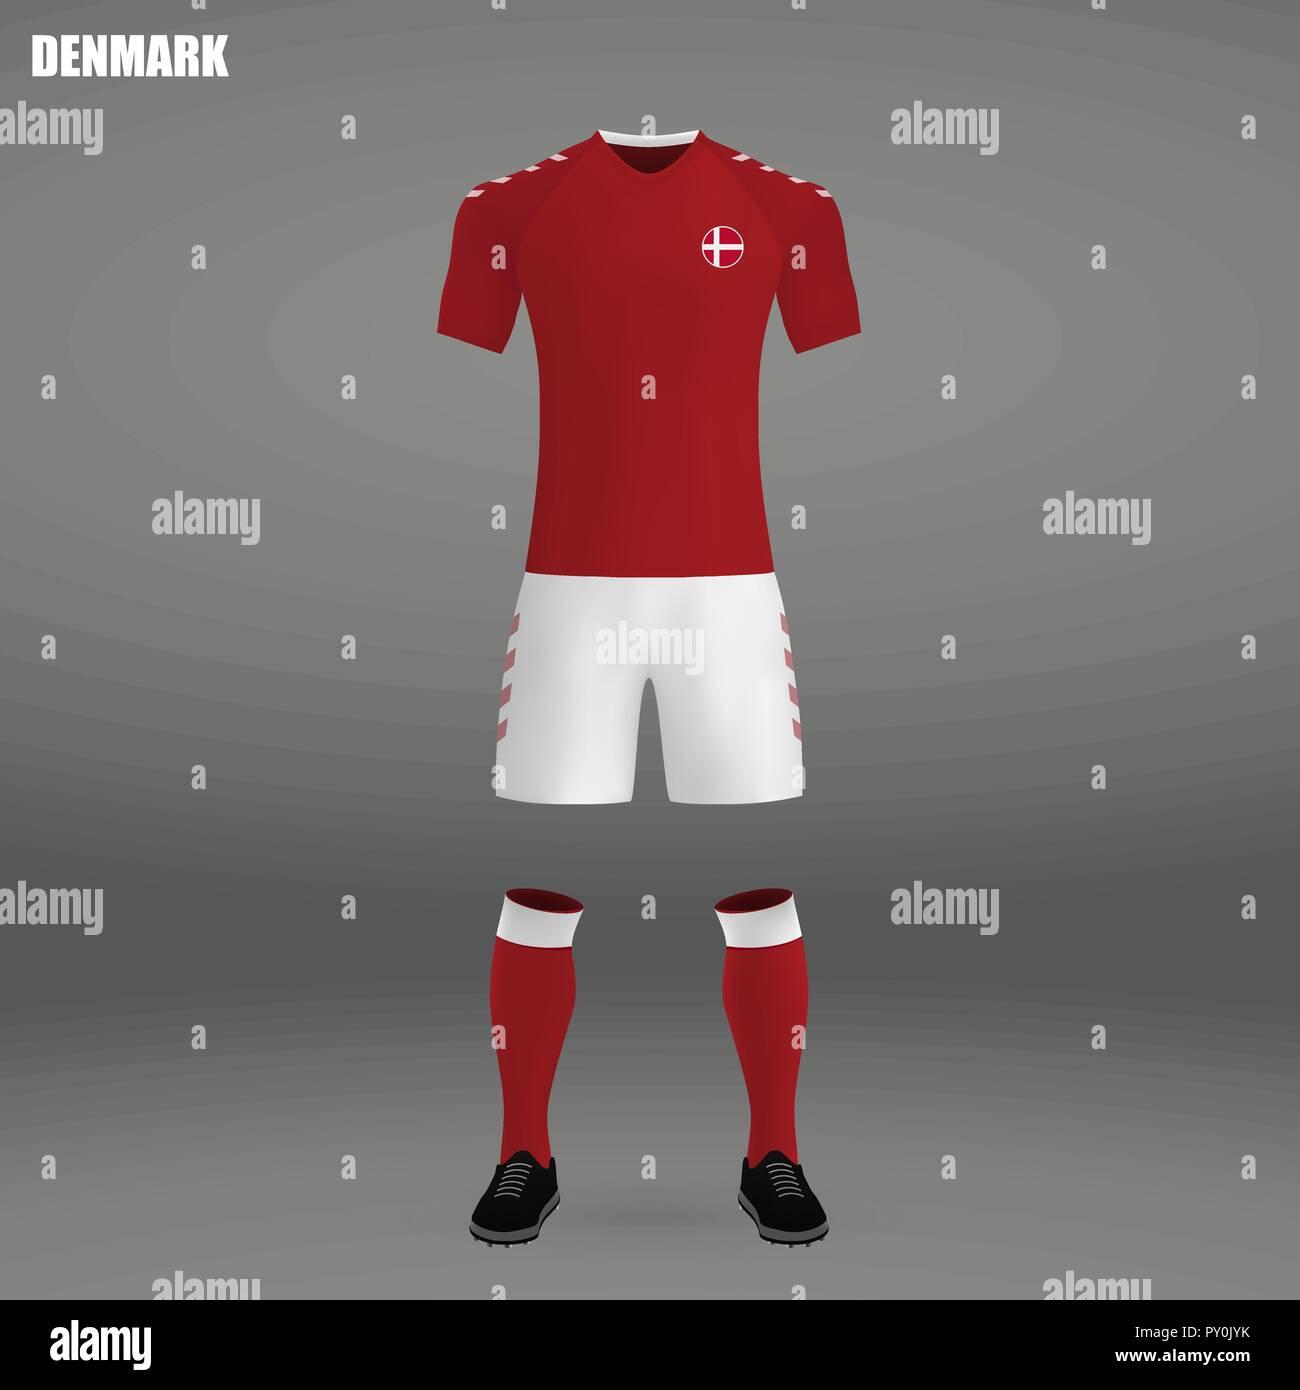 7e6be2a79 football kit of 2018